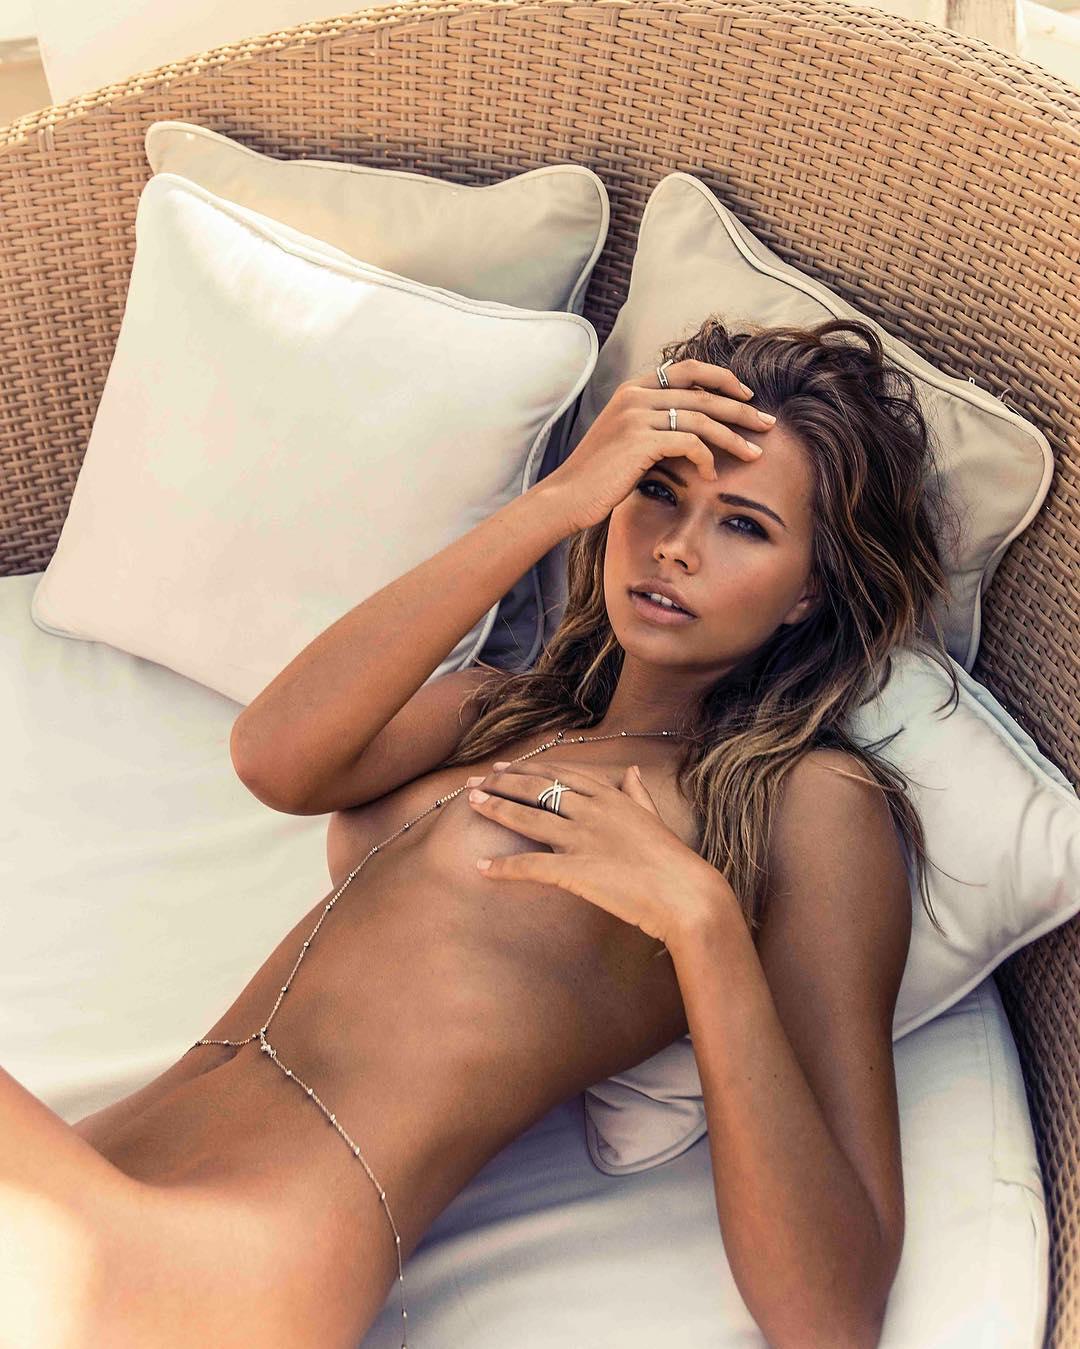 fotografias-de-sandra-kubicka-desnuda-xxx-famosas-desnudas-clebrity-topless-fotos-roobadas-xxx-videos-porno-follando-descuidos-hackers-8